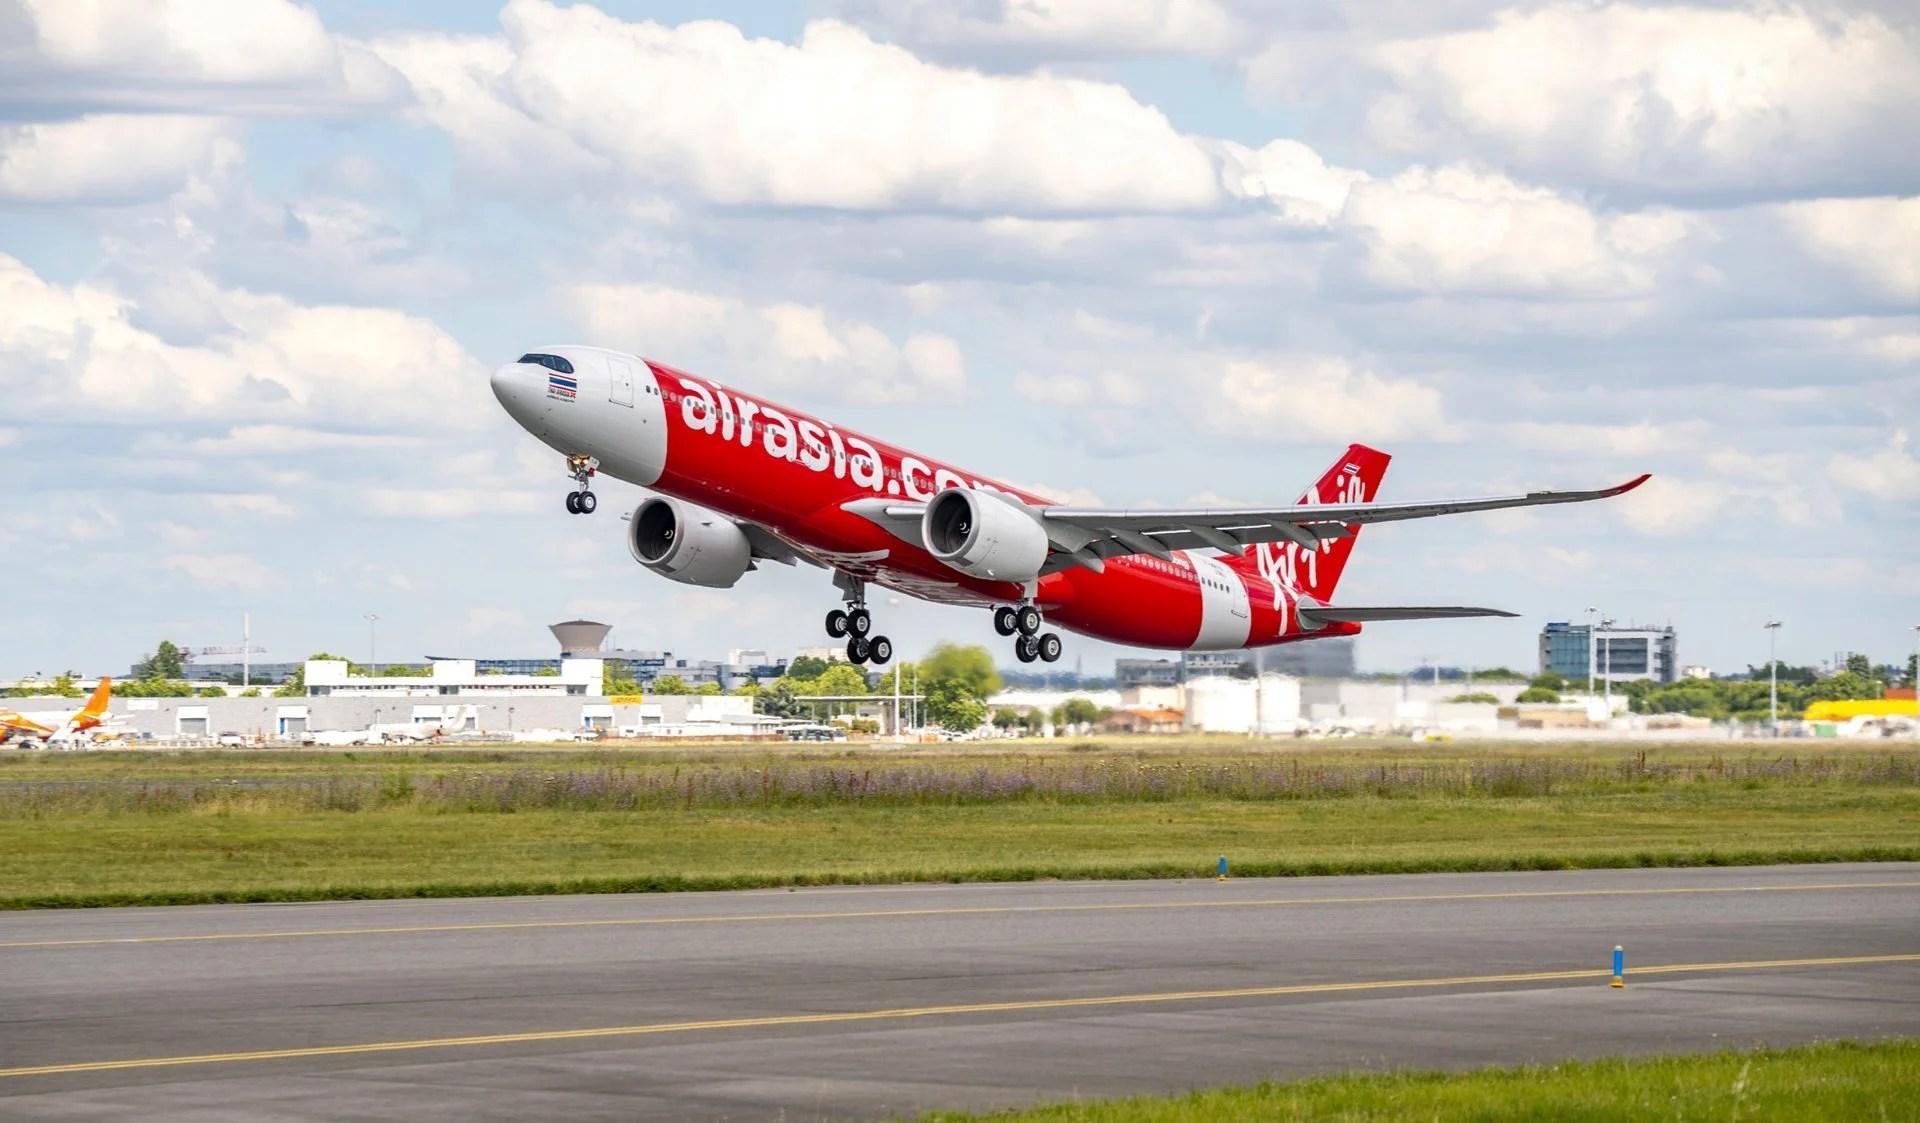 AirAsia X says new California flights could begin as soon as 2021